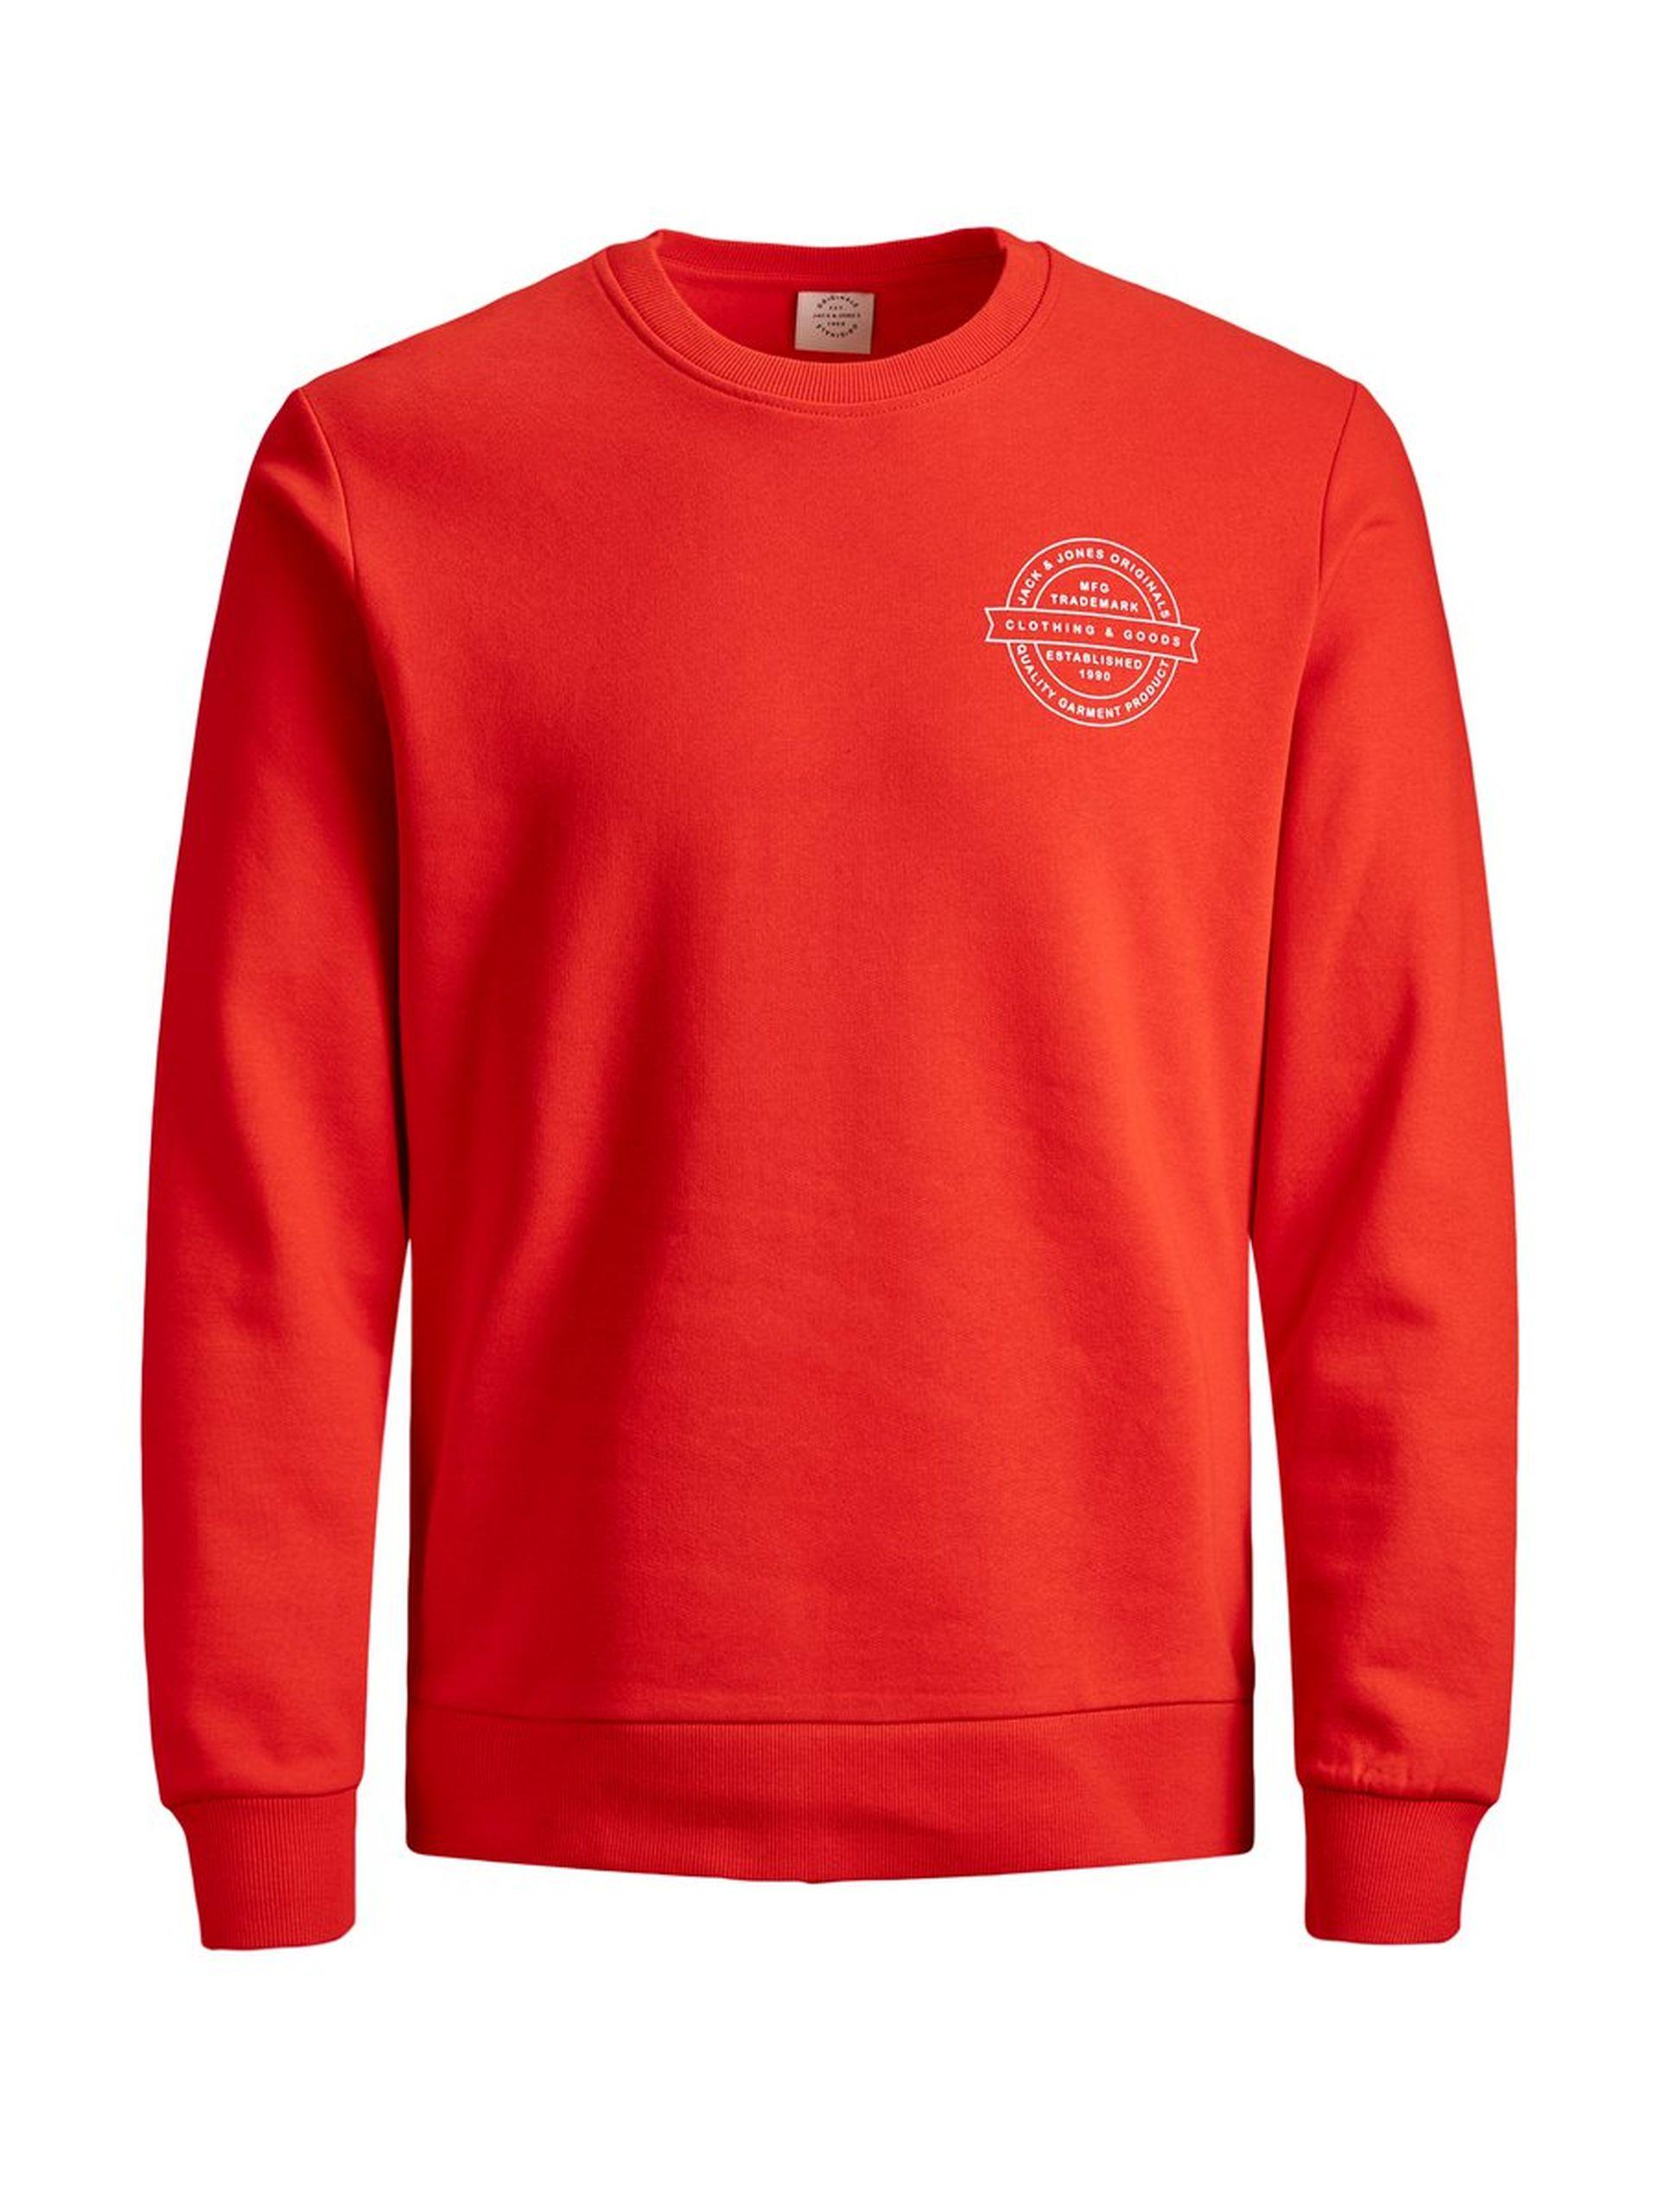 Jack & Jones Sweatshirt in Ferrarirot bzw. Lila mit kleinem Print (Gr. S-2XL)